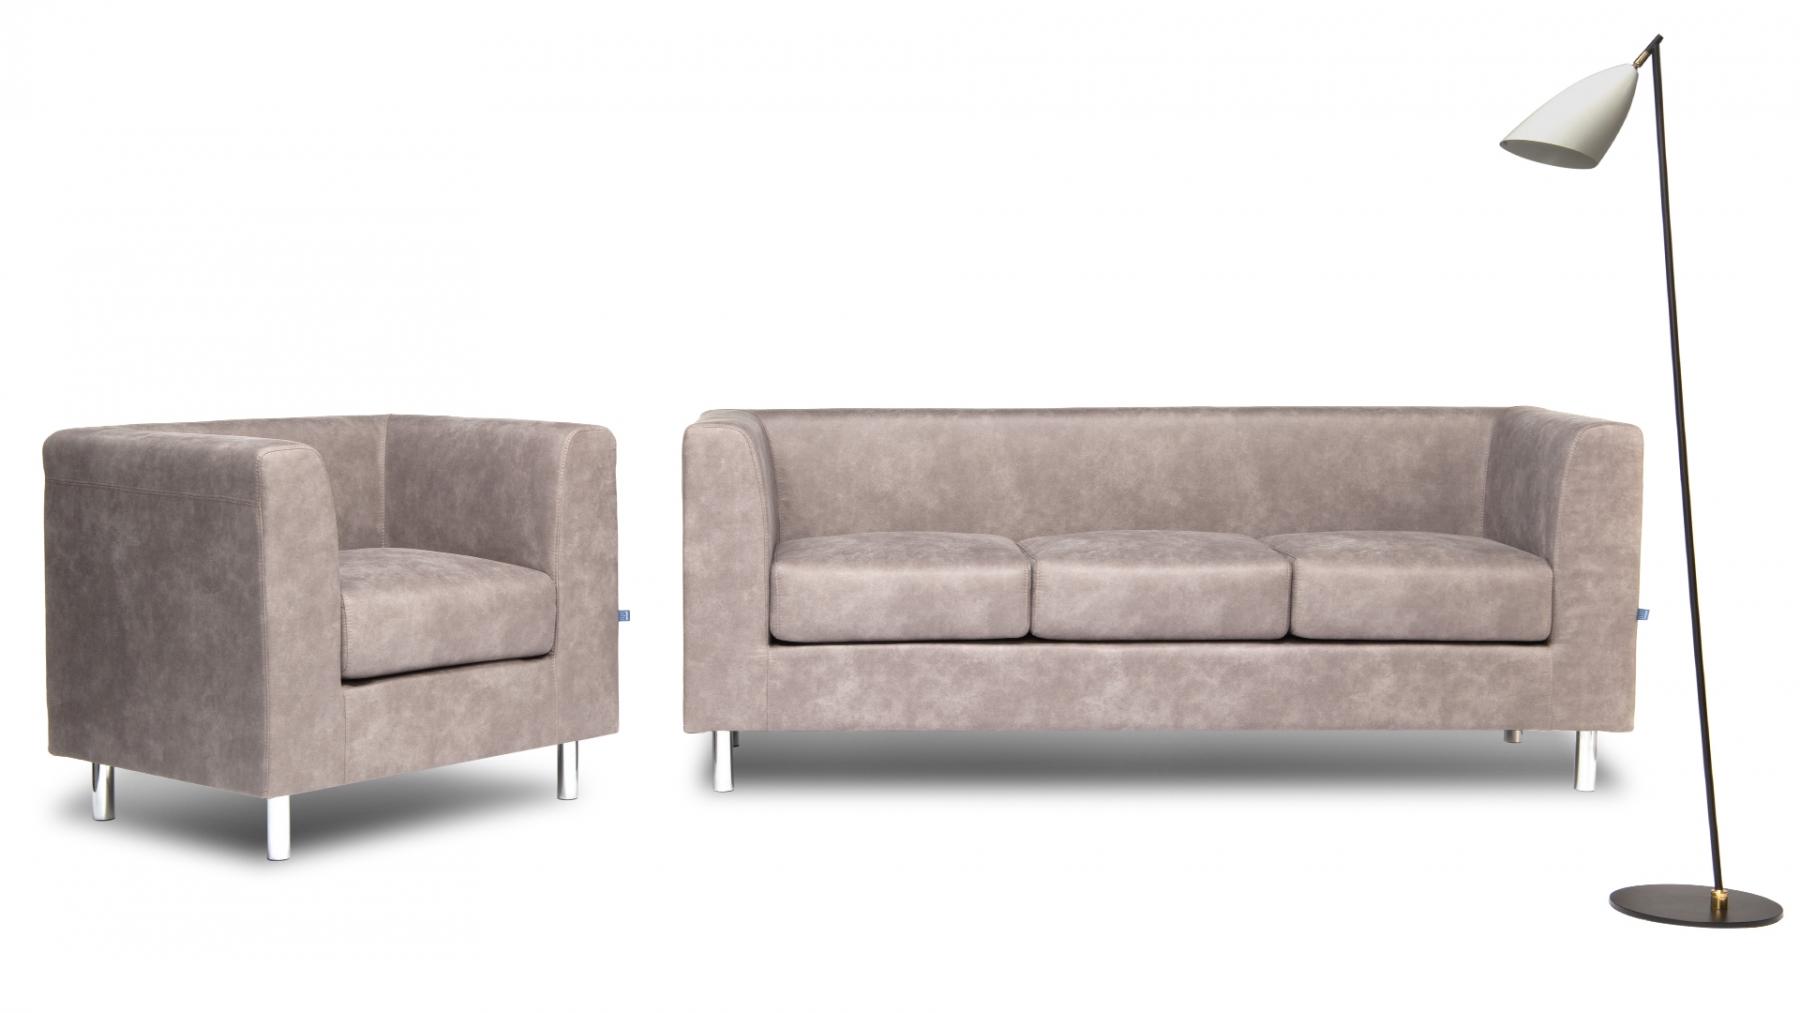 Тайм-кресло-диван